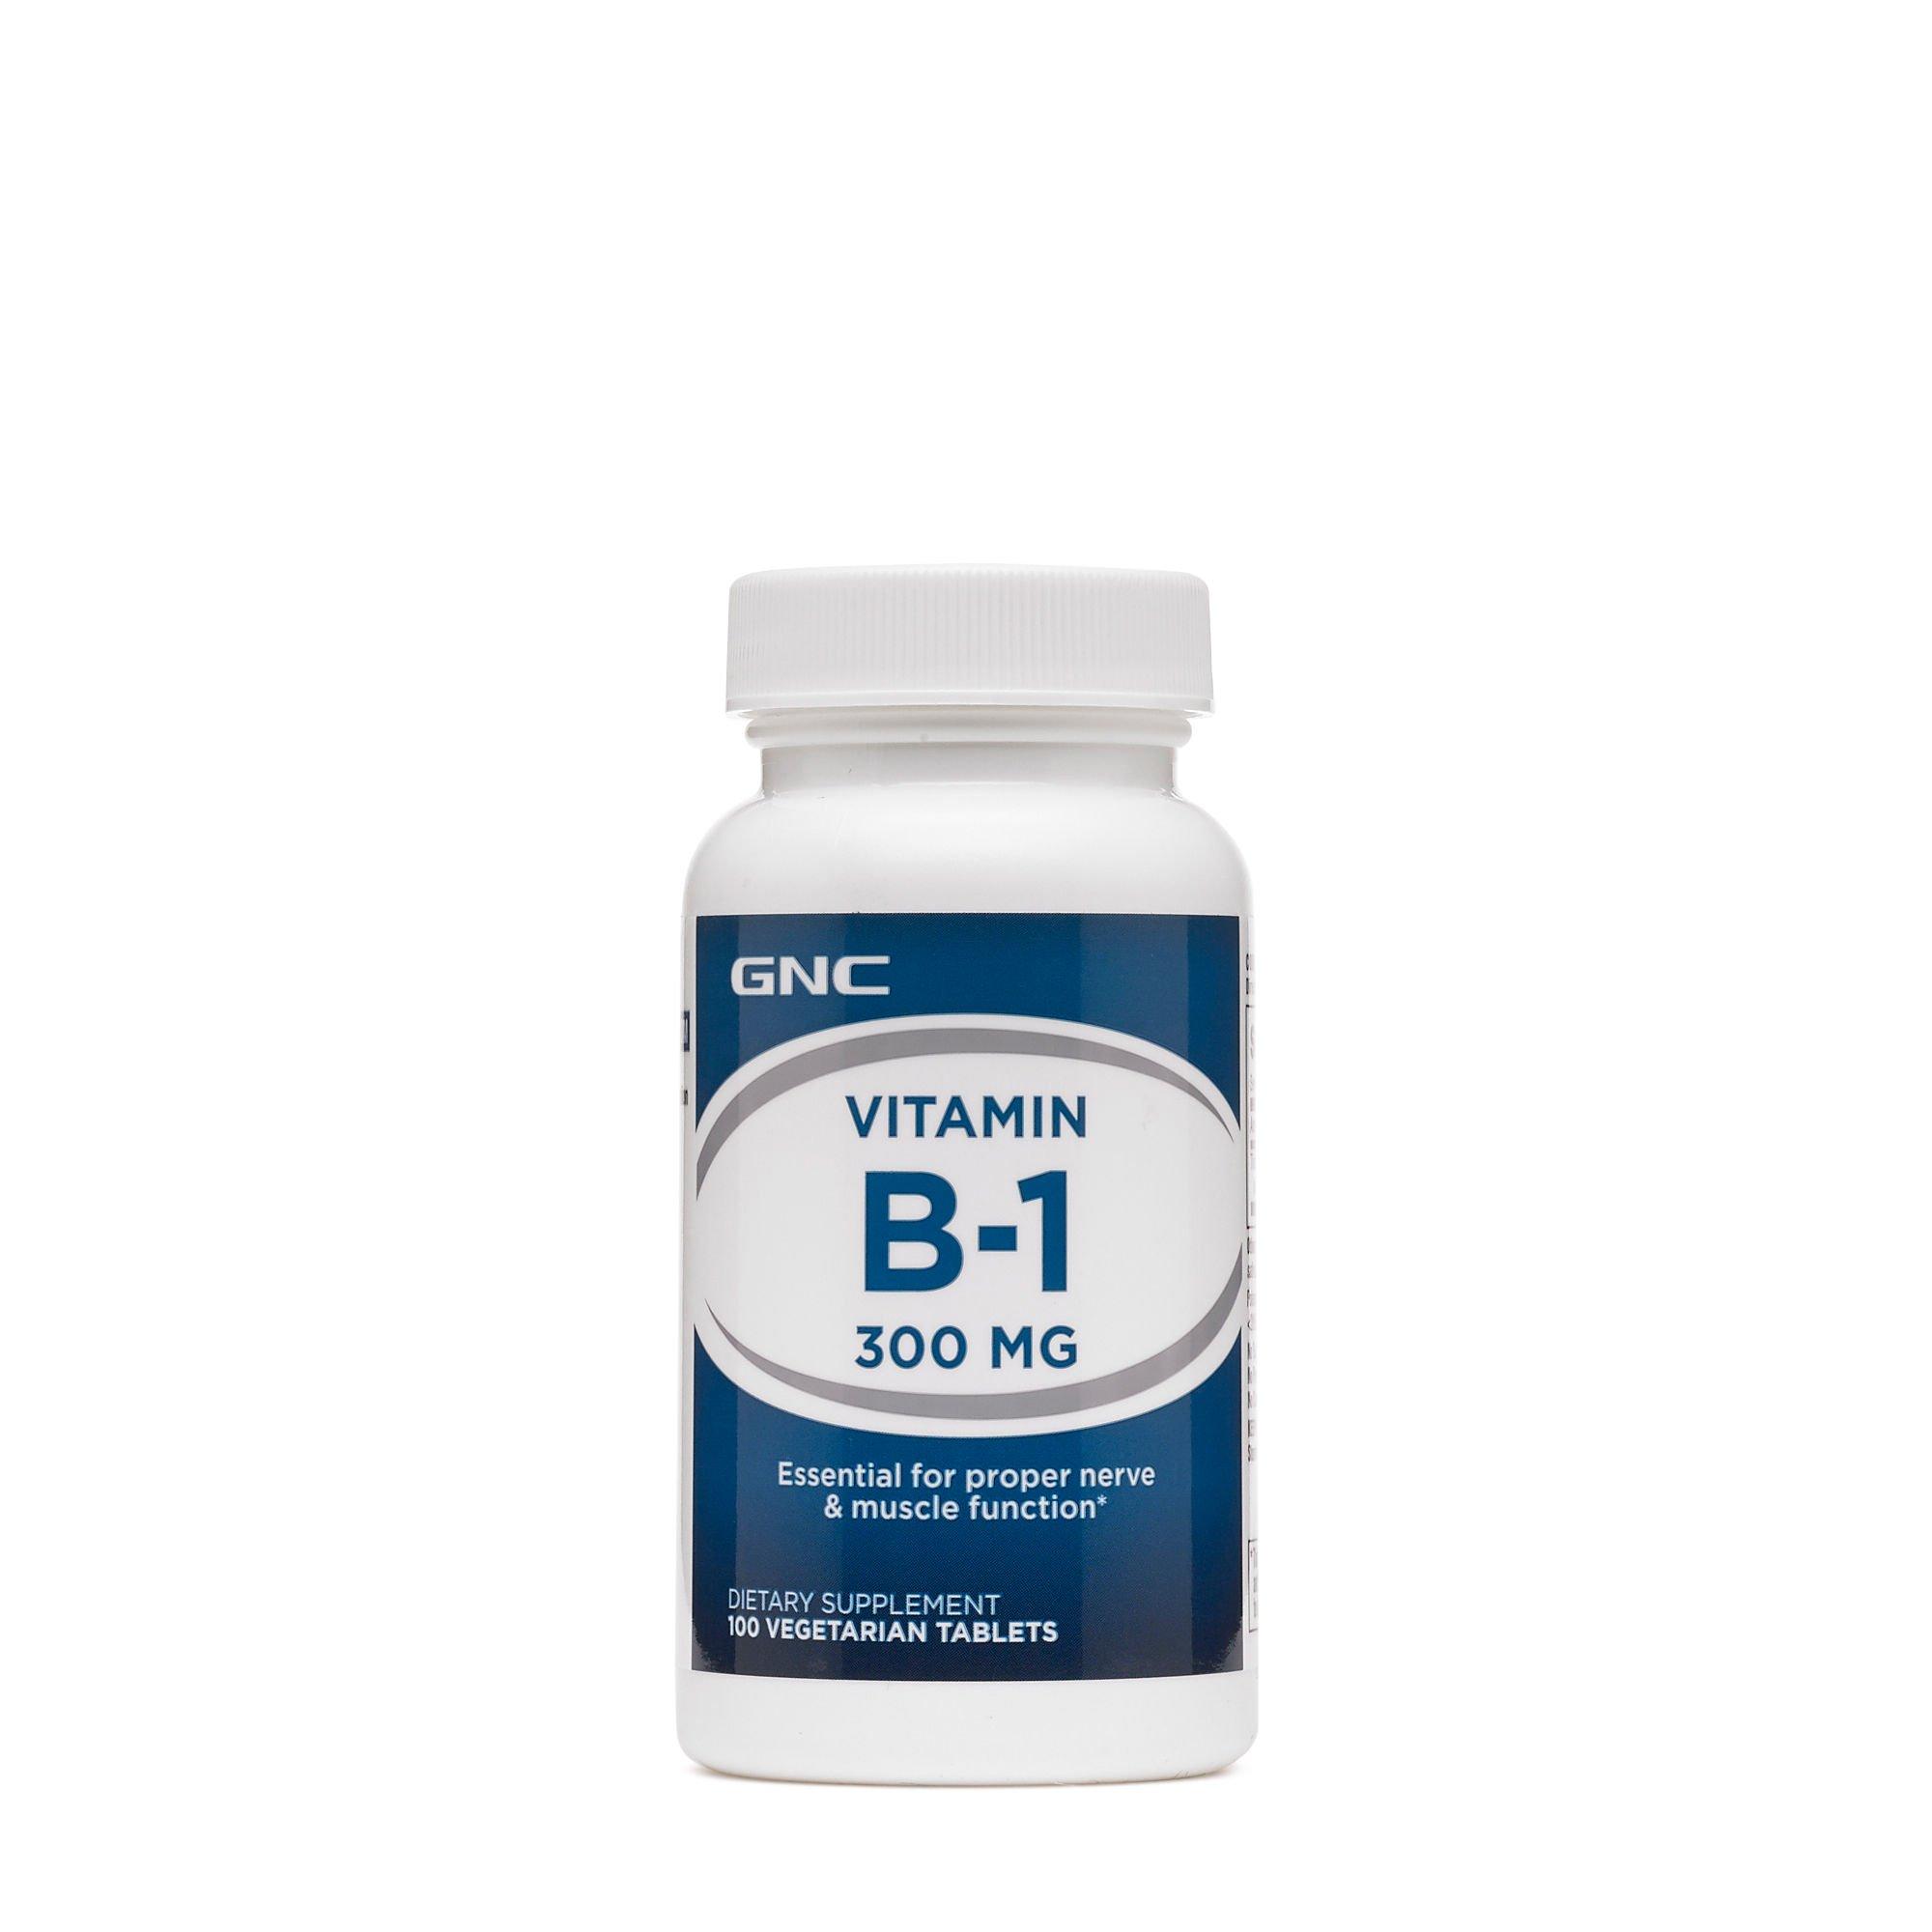 GNC Vitamin B-1 300mg, 100 Tablets